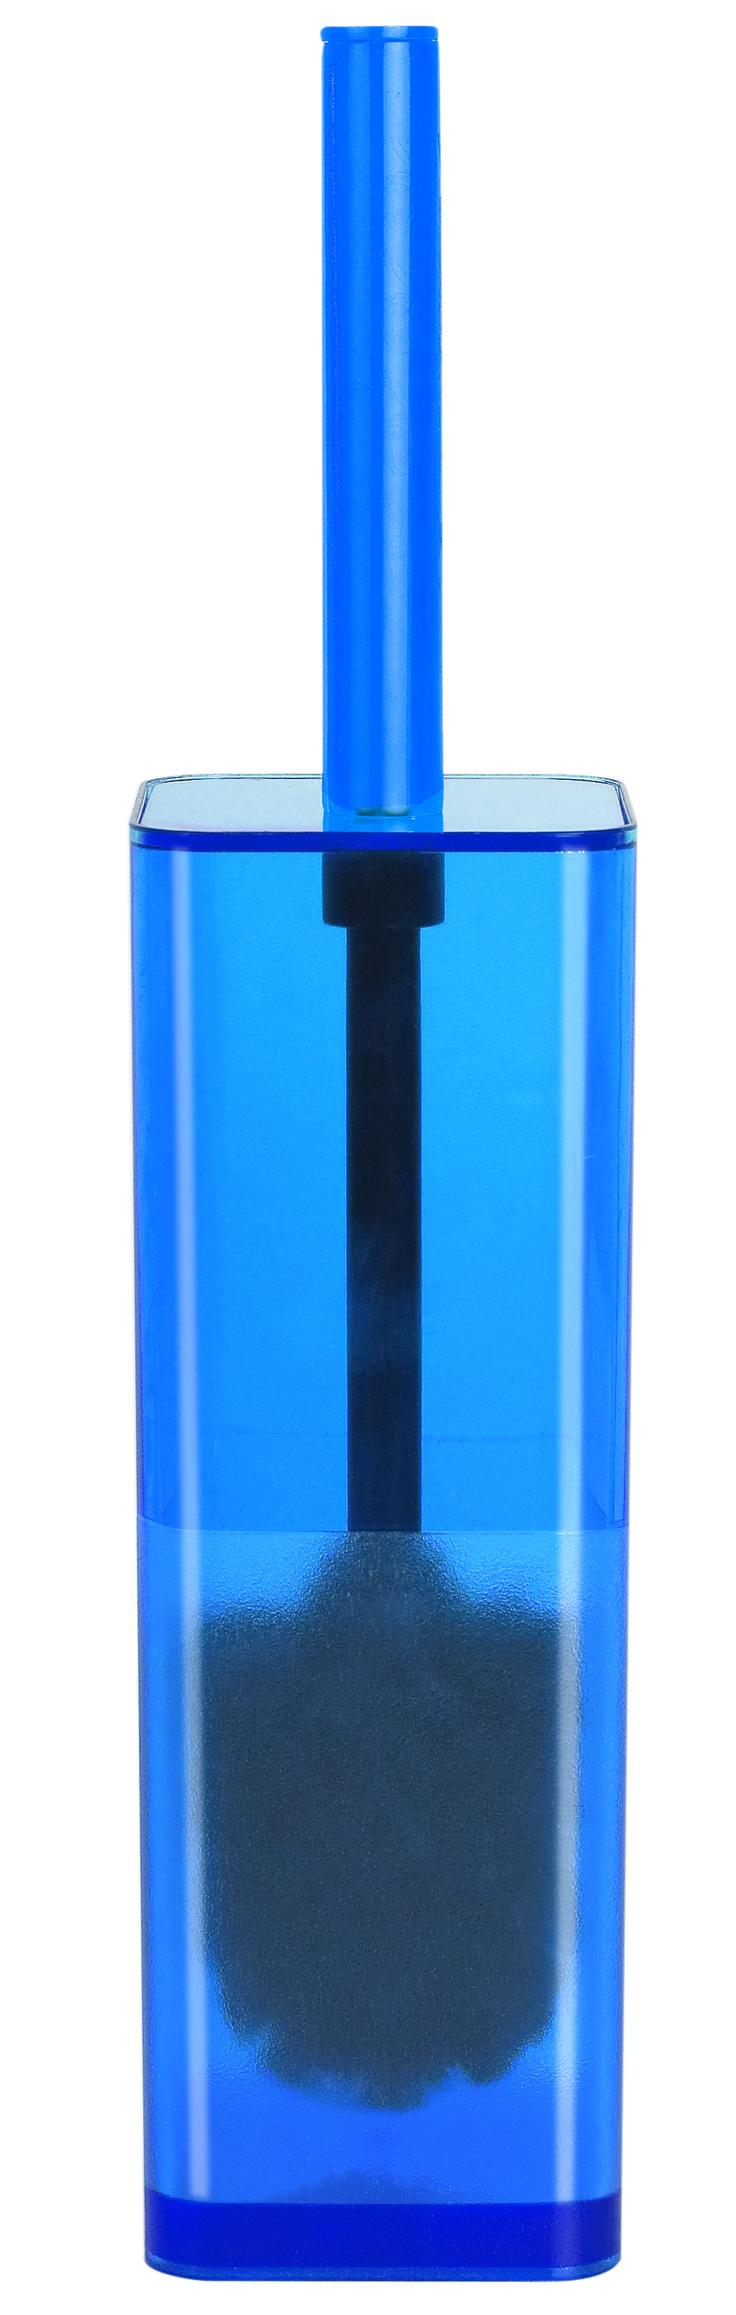 #Spirella Blue Cubo Toilet Brush. #bathroom #blue